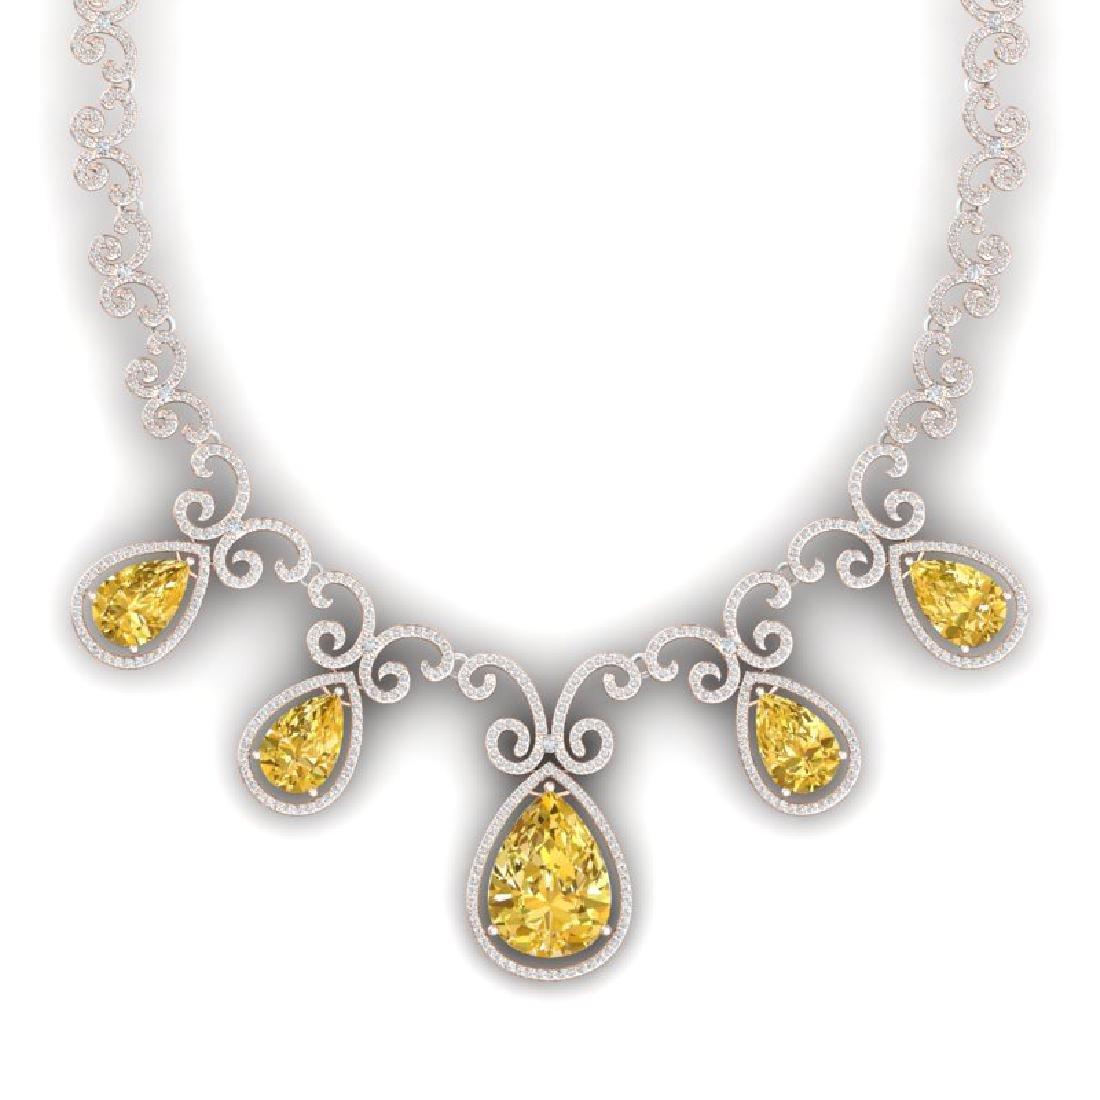 36.1 CTW Royalty Canary Citrine & VS Diamond Necklace